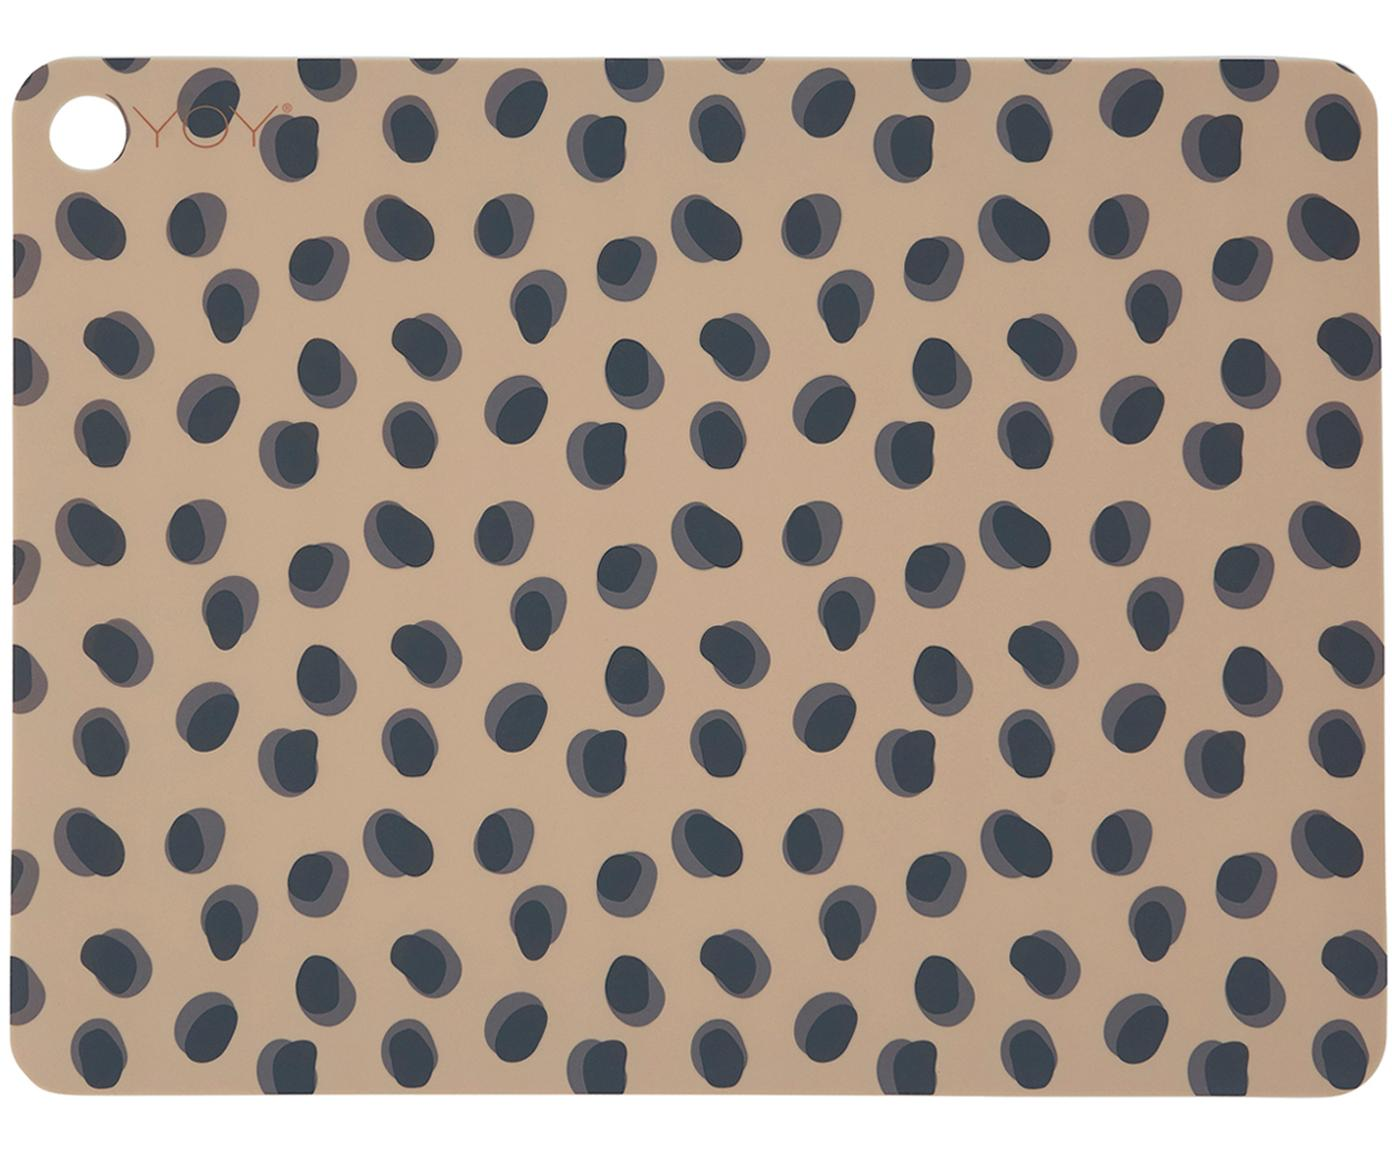 Silikon Tischsets Leopard, 2 Stück, Silikon, Karamellbraun, Schwarz, 34 x 45 cm